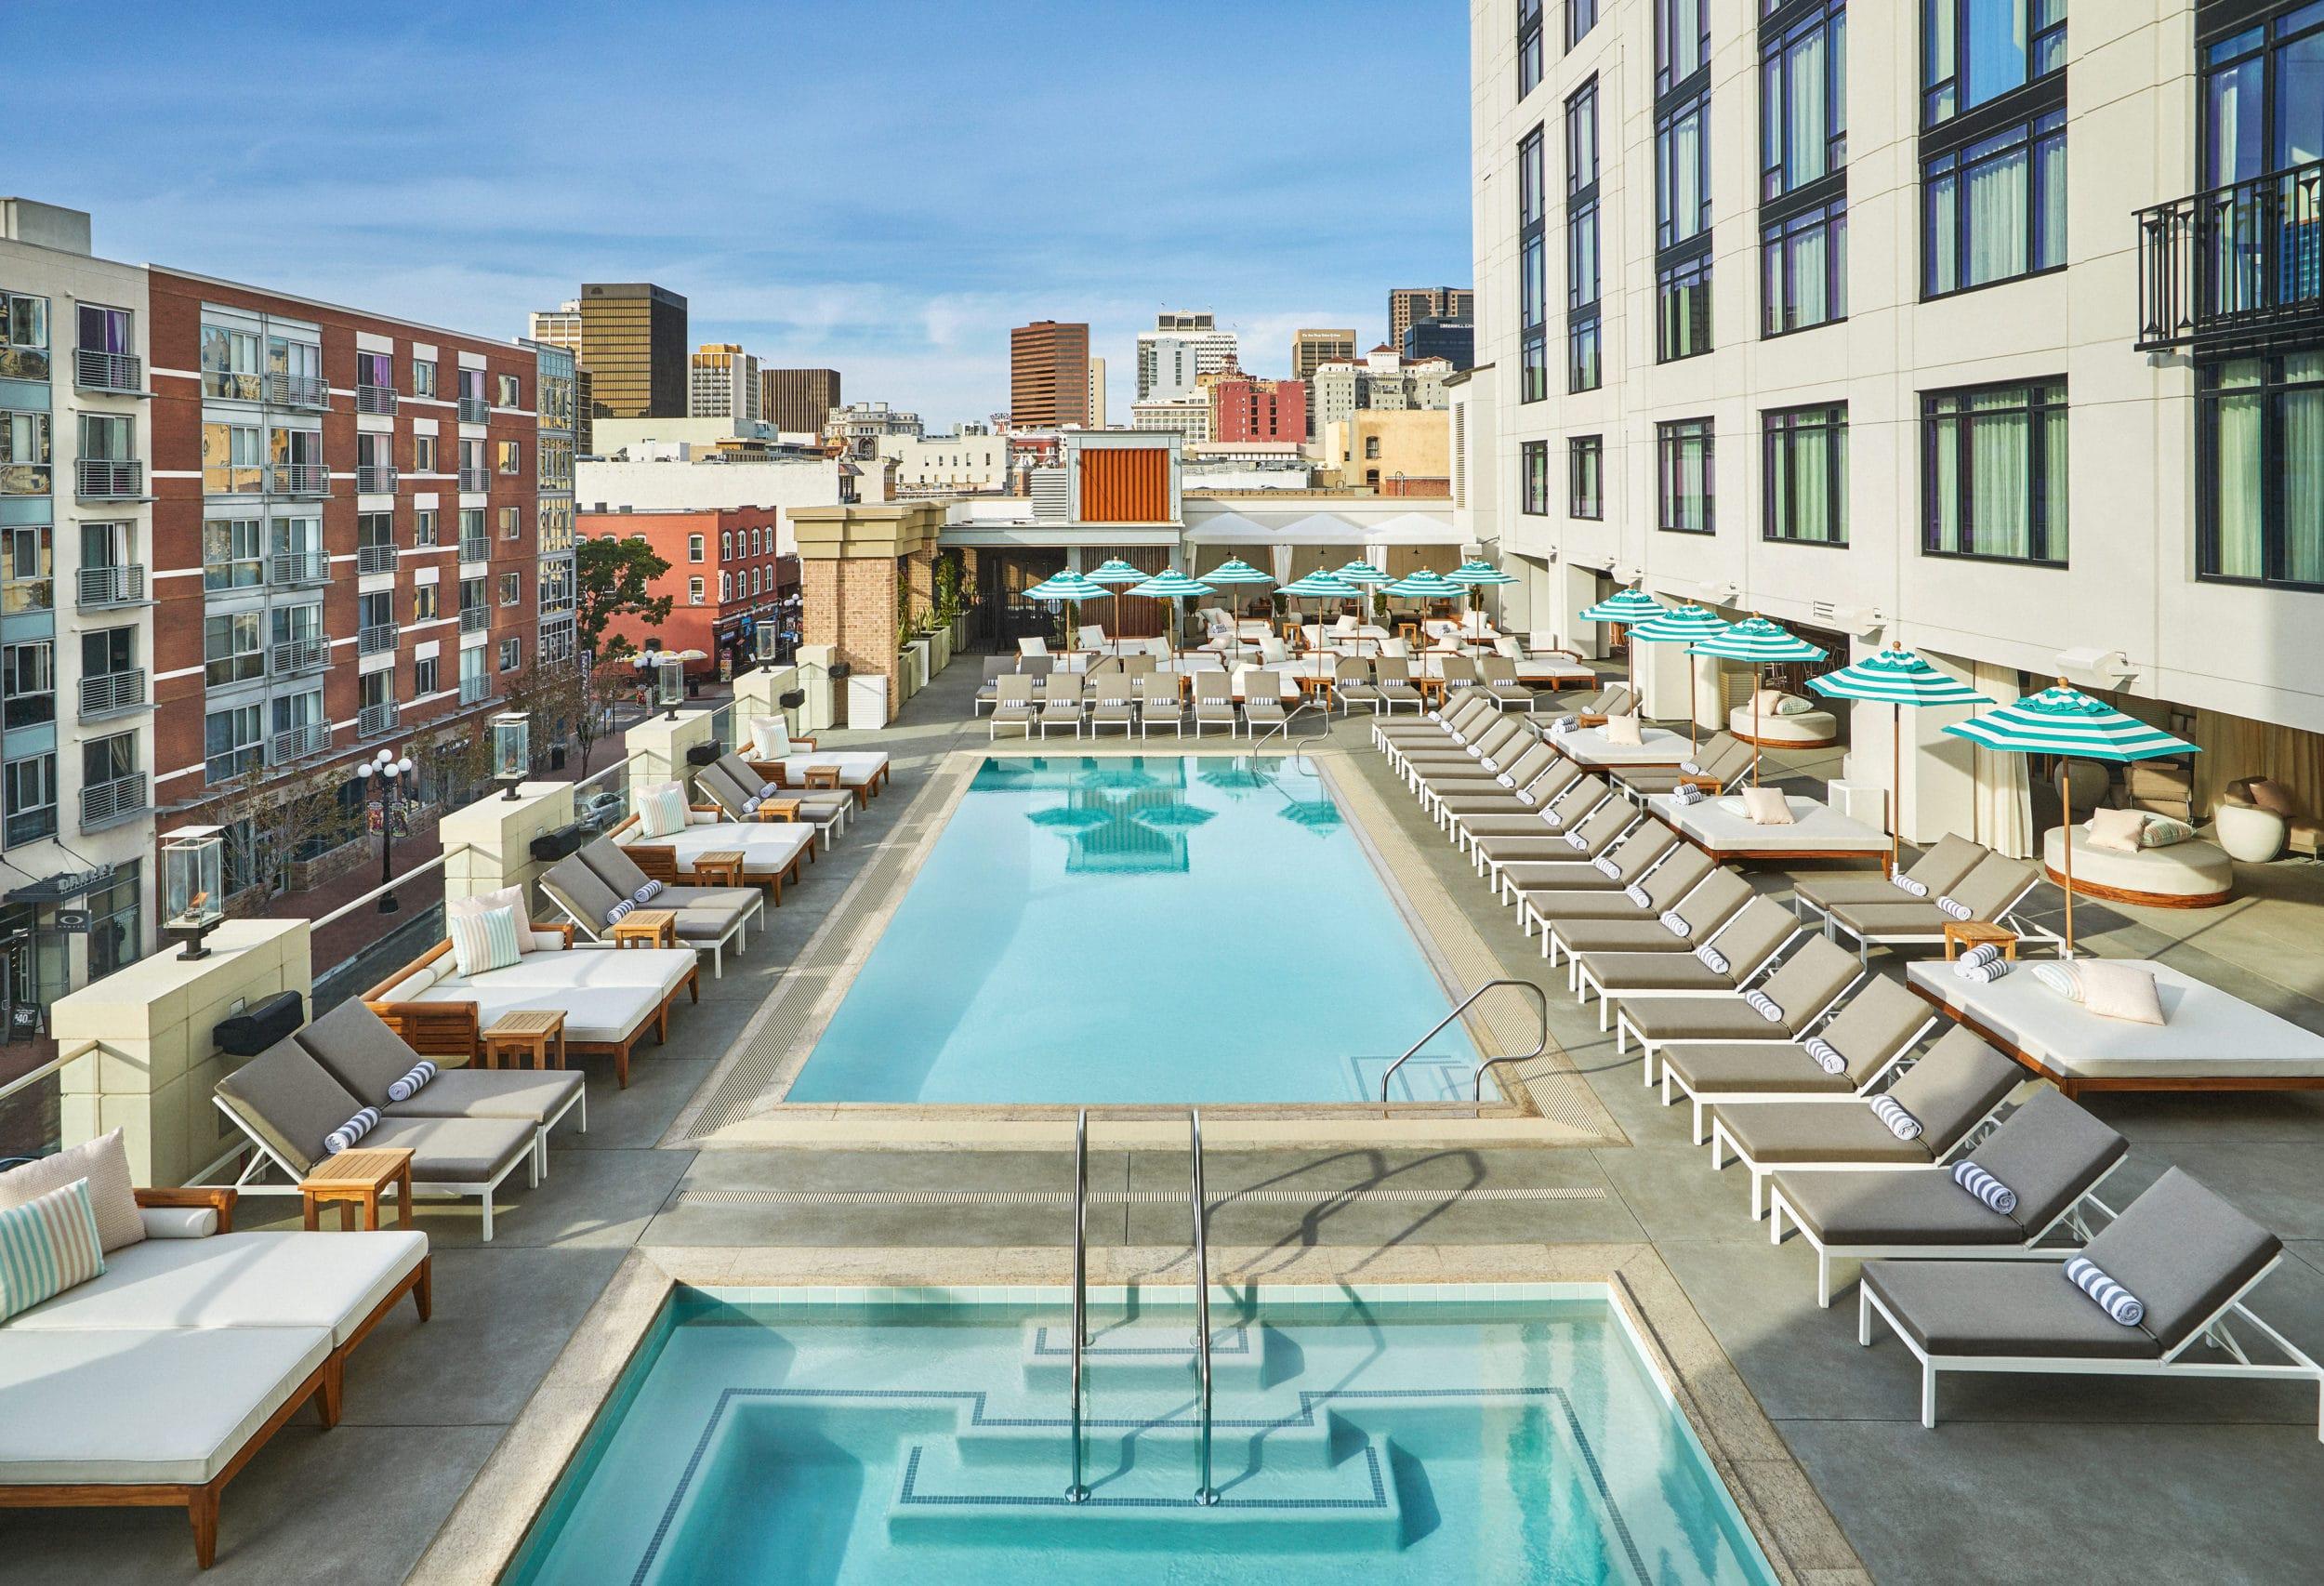 pendry san diego pool hotel